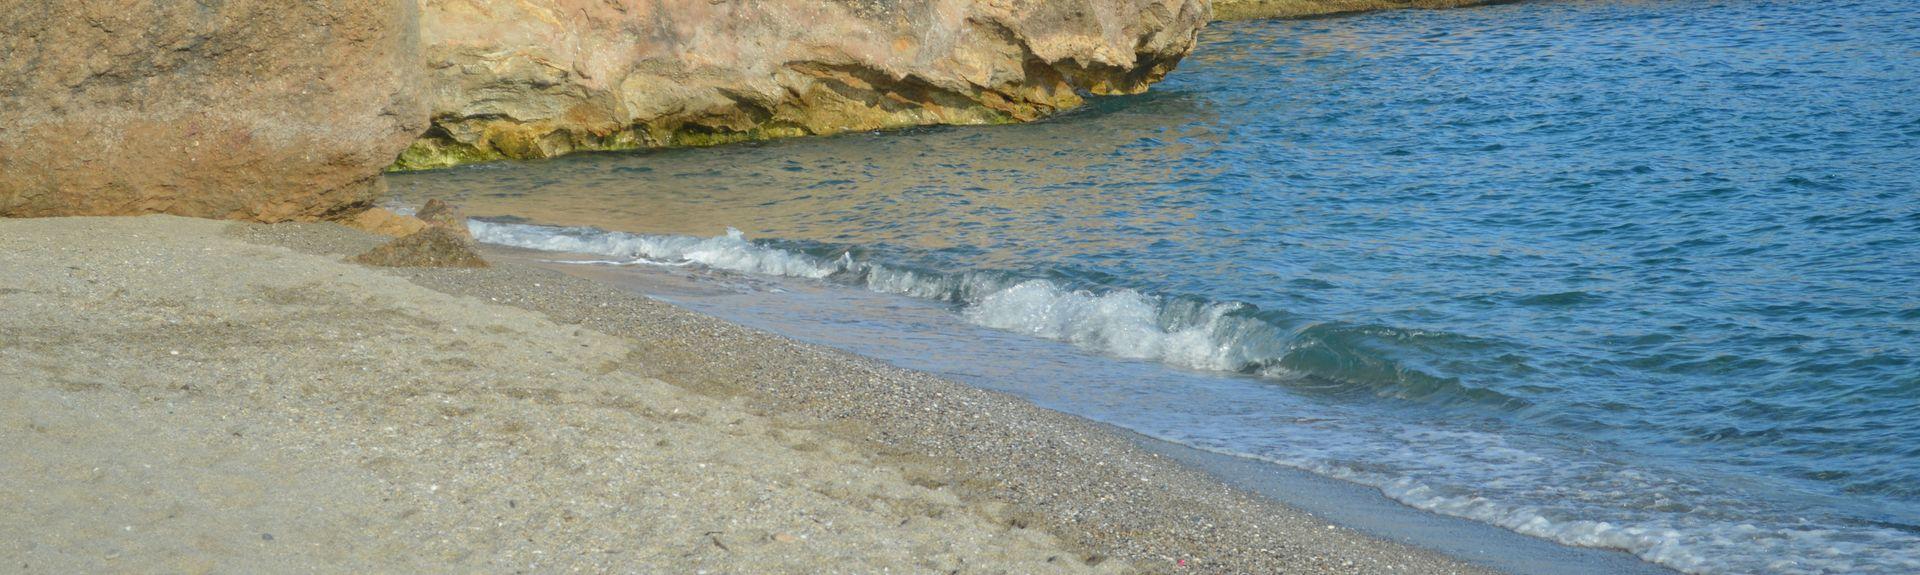 Urbanización Capistrano Playa (Nerja, Andaluzia, Espanha)